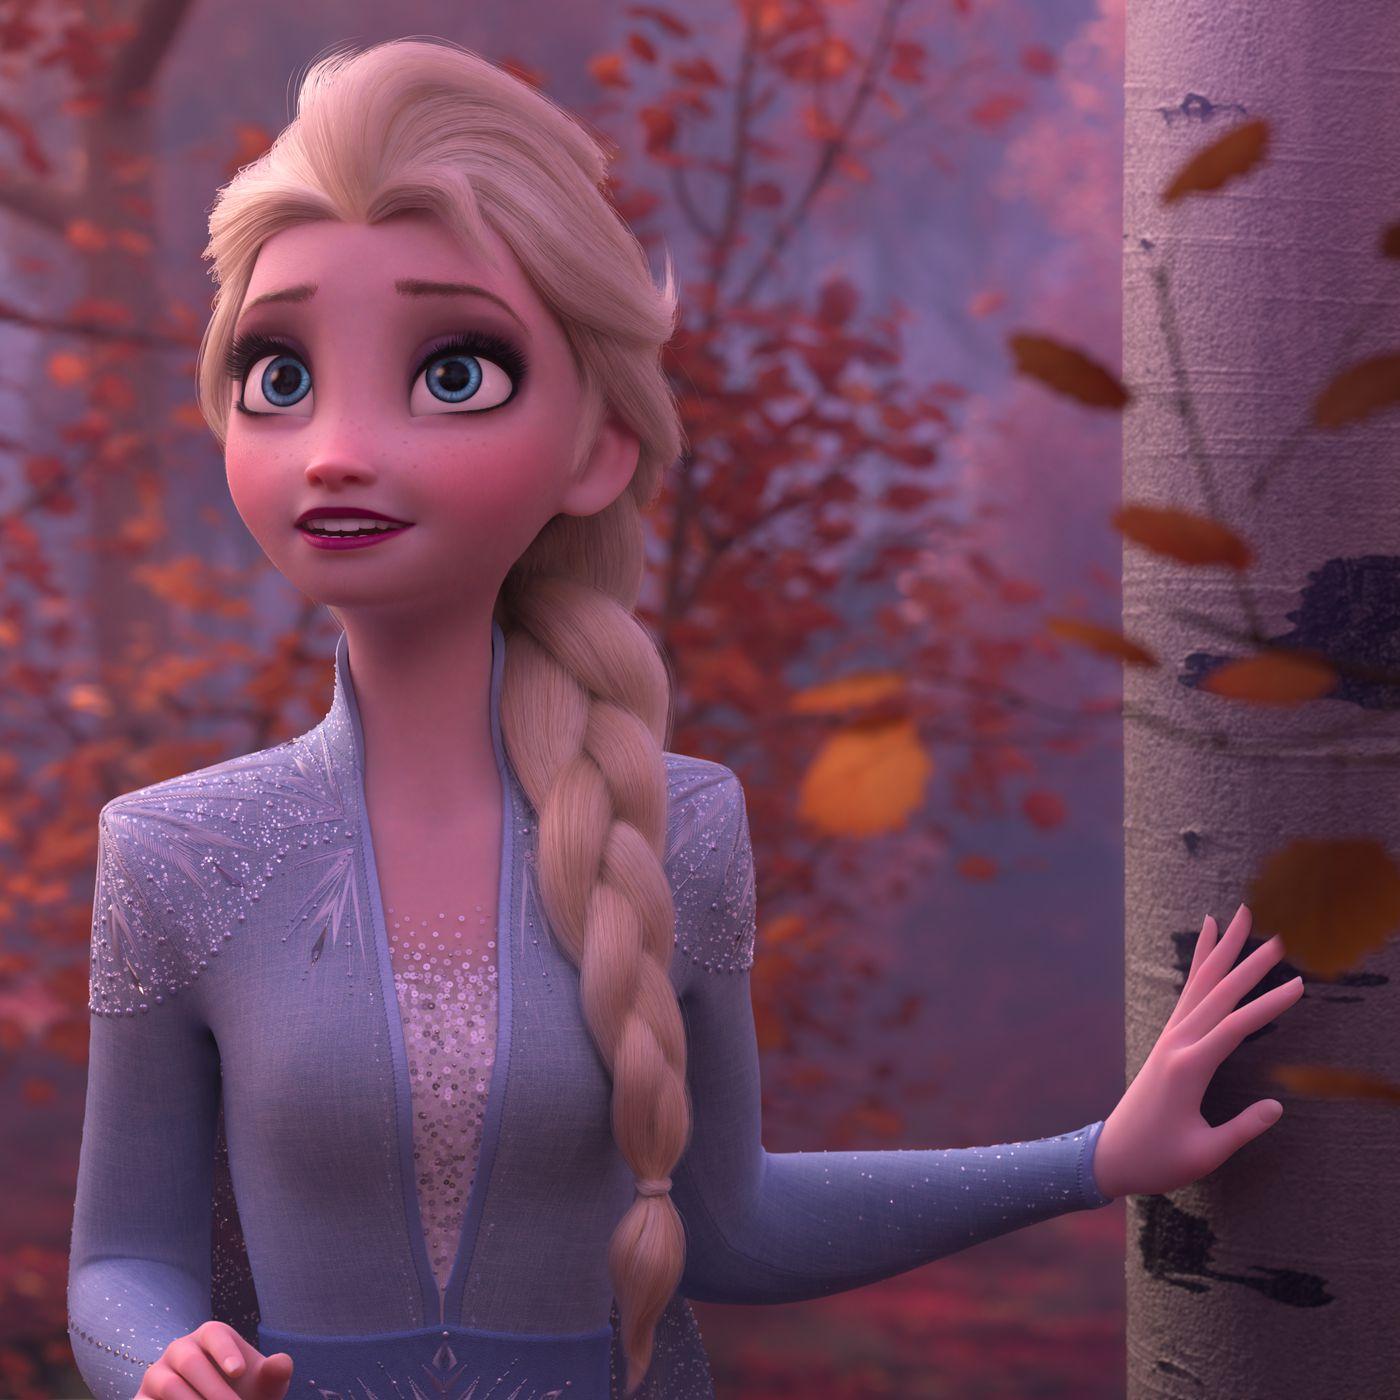 frozen elsa is a queer icon why won t disney embrace that idea